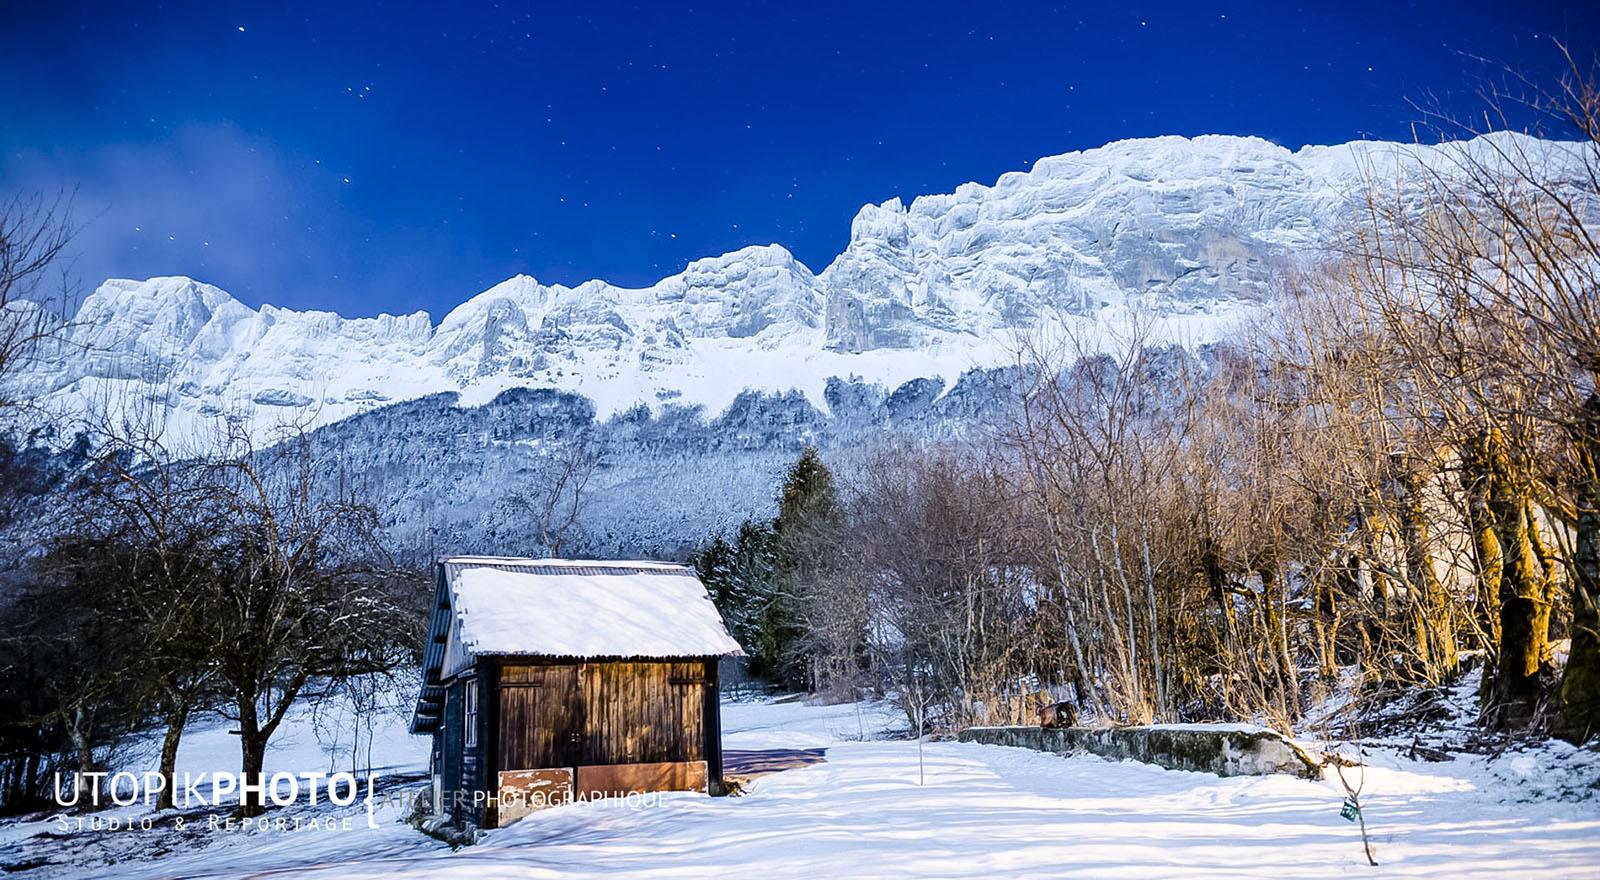 photographe paysage à Grenoble